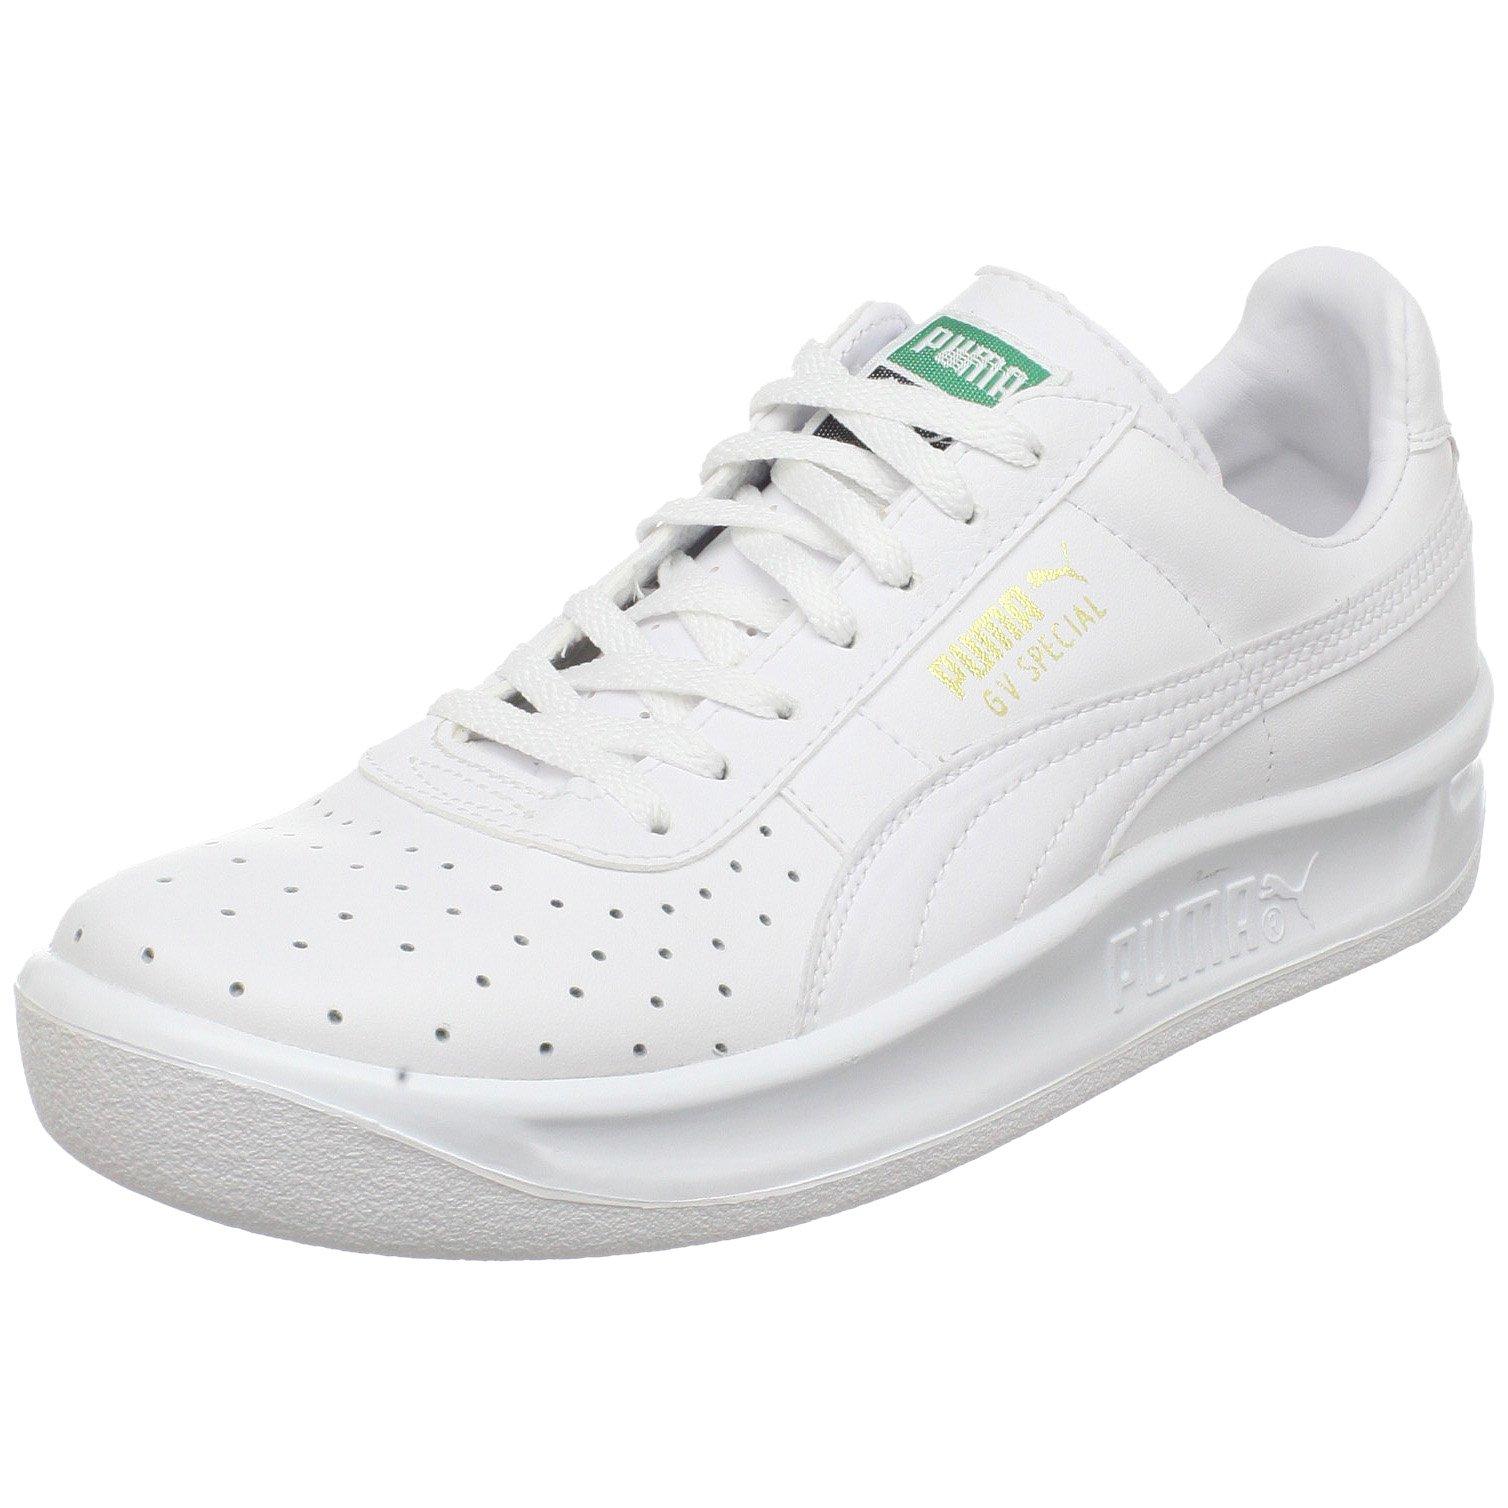 PUMA GV Special Sneaker, White, 5 M US Big Kid